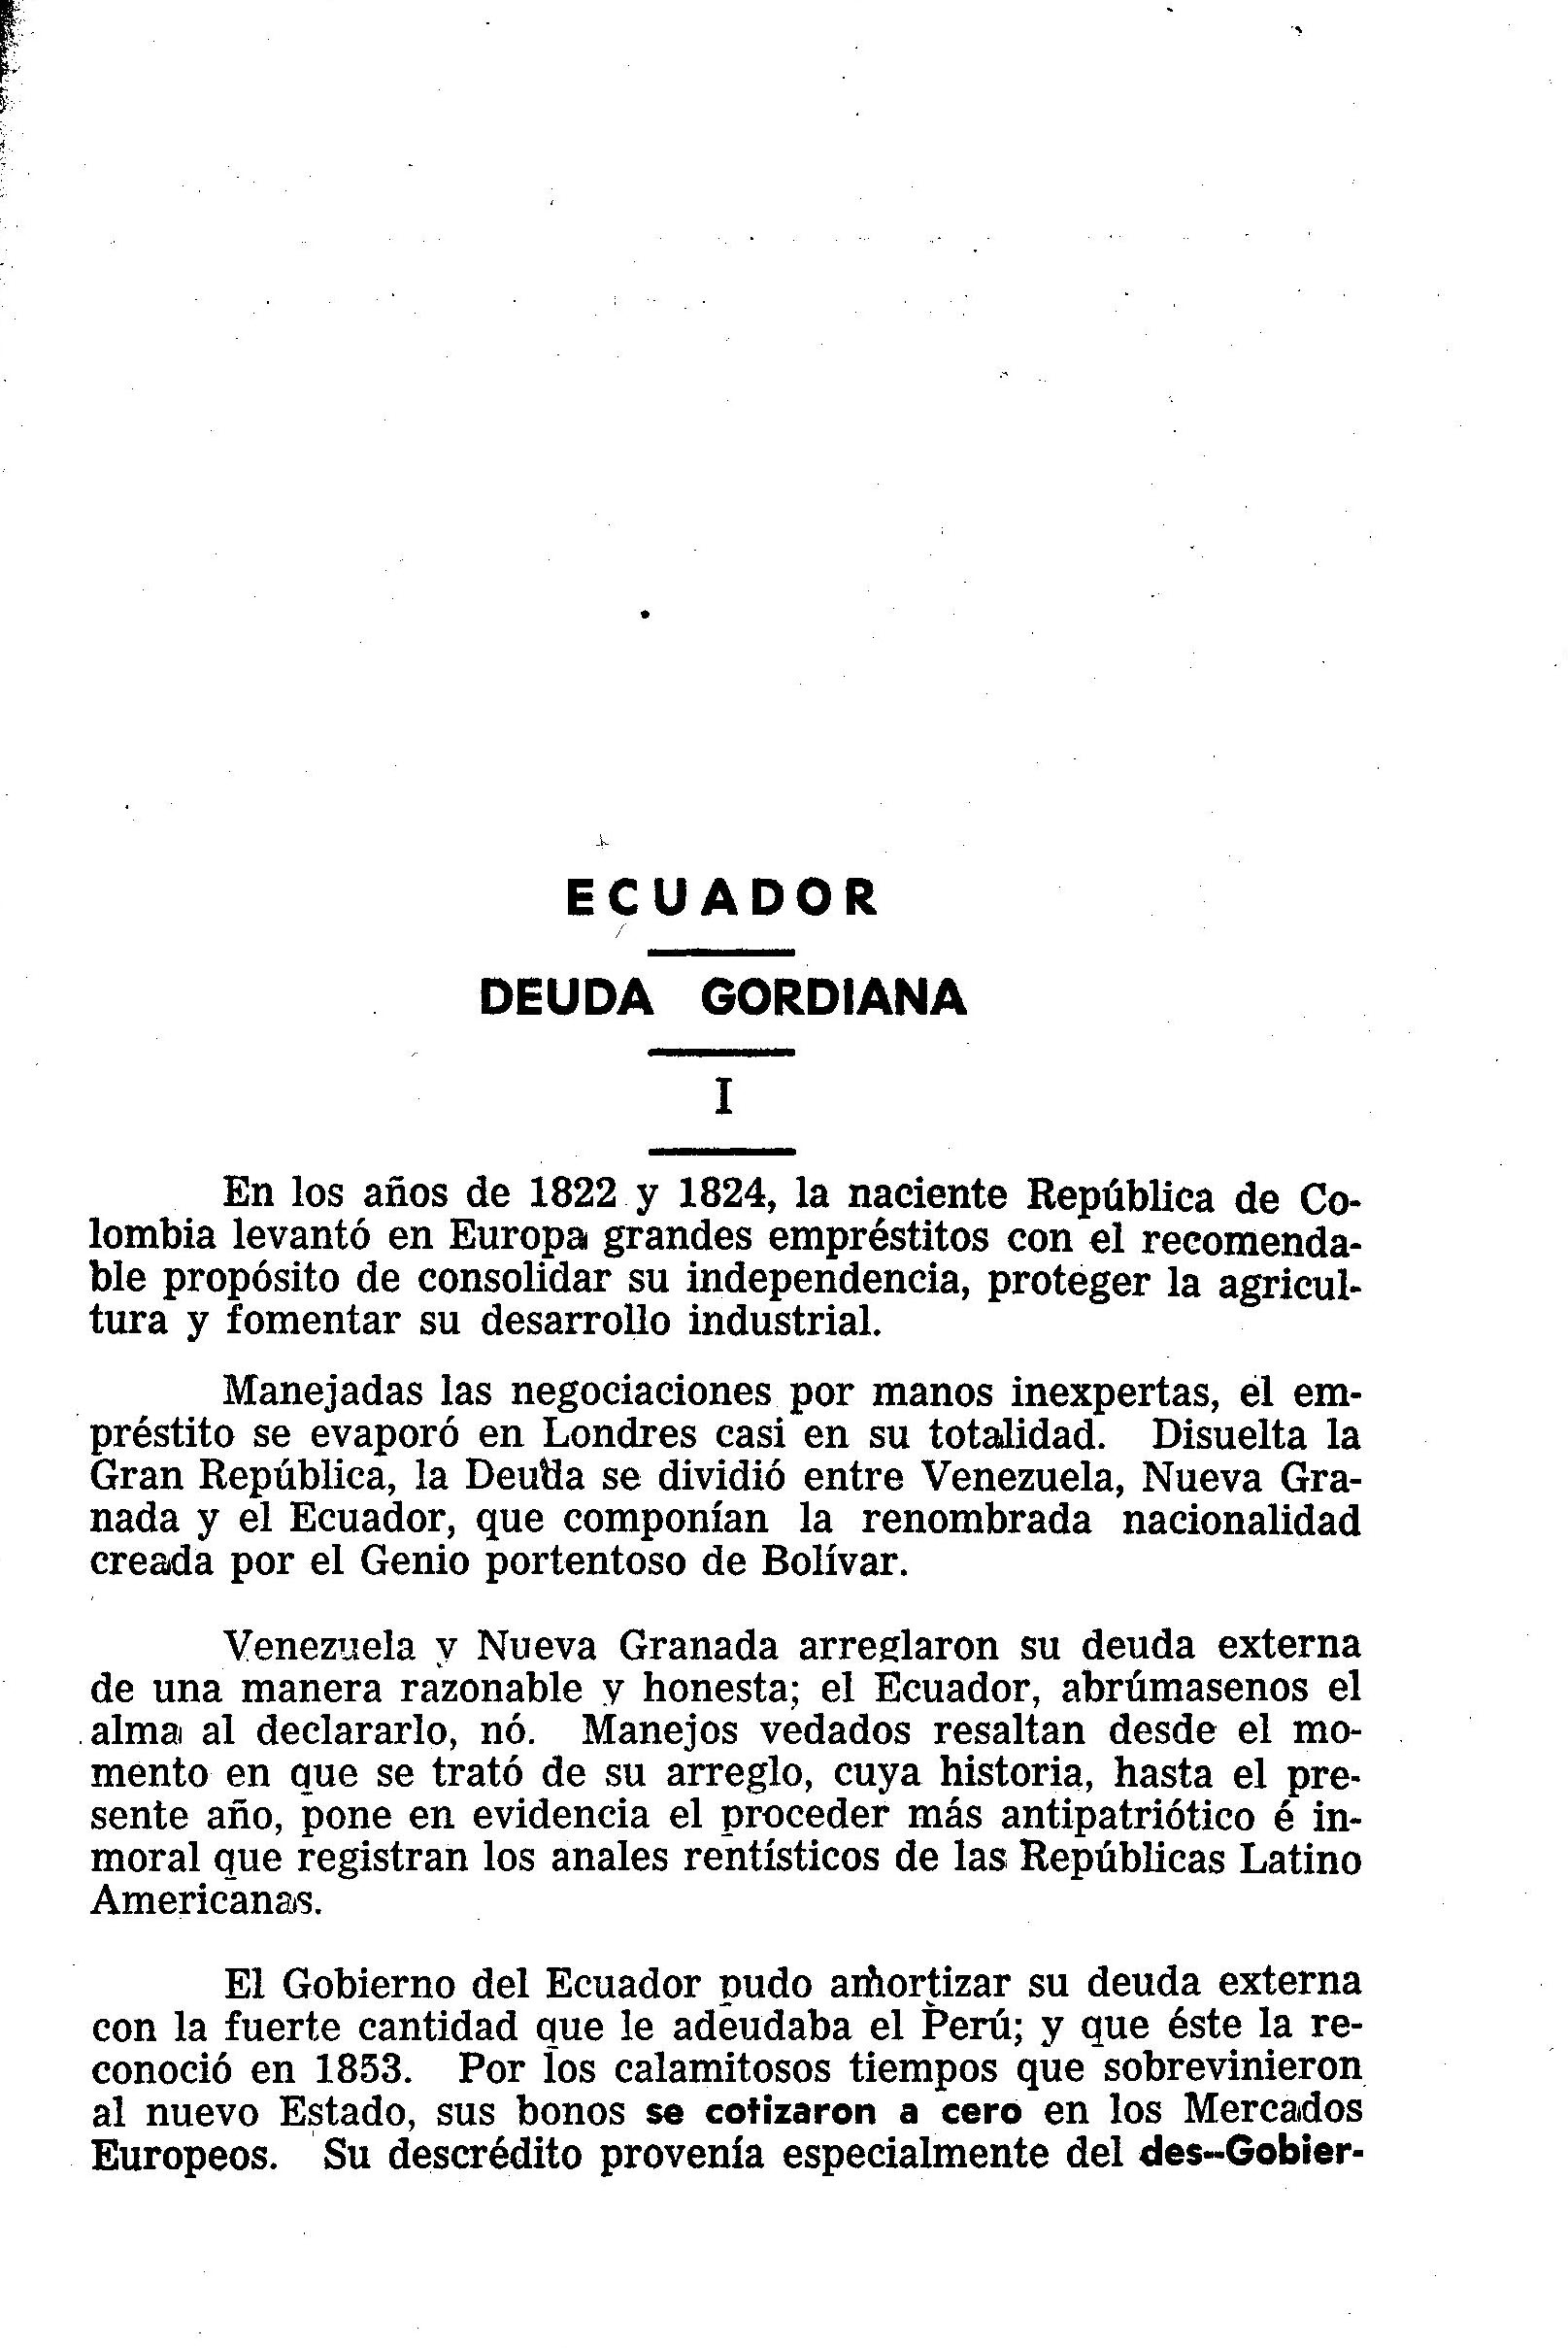 Index of /Deuda_Gordiana-ed2